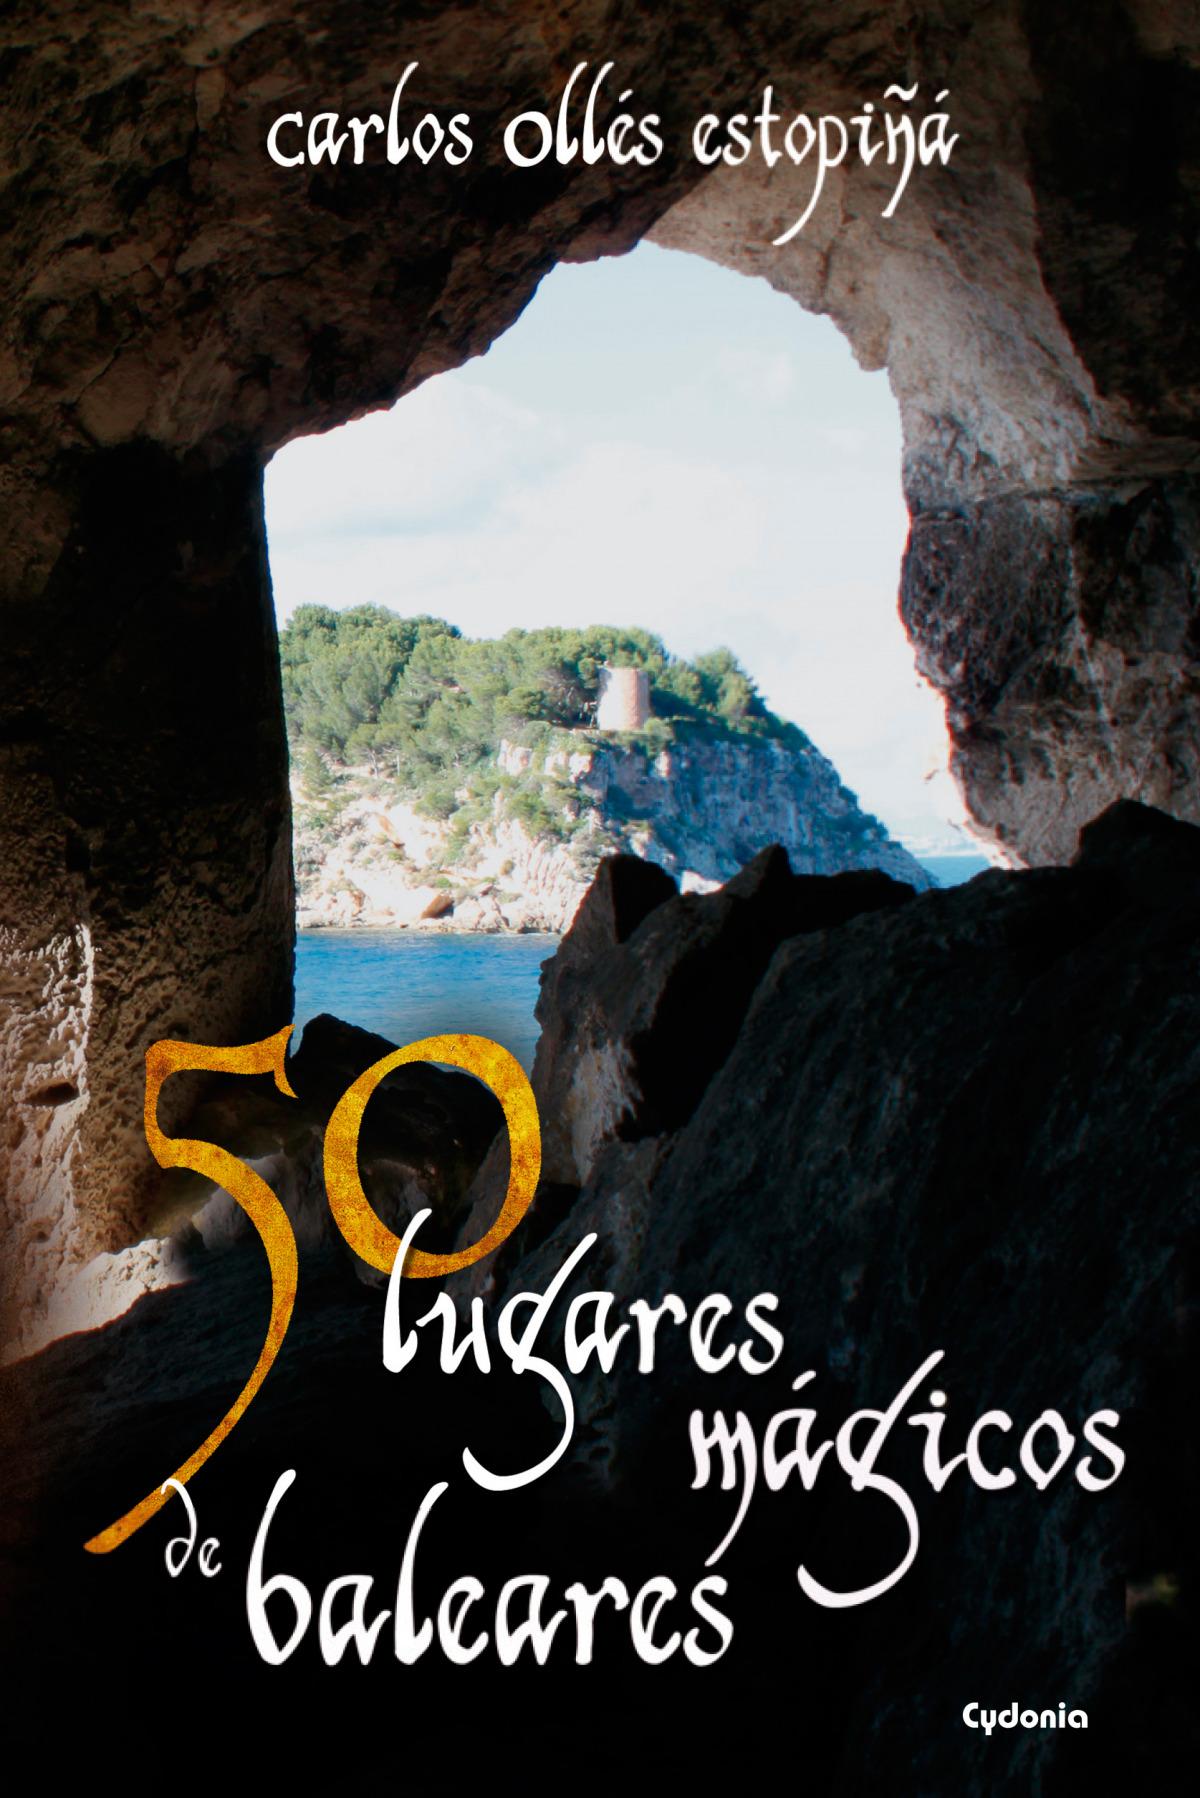 50 lugares mágicos de Baleares 9788494508462